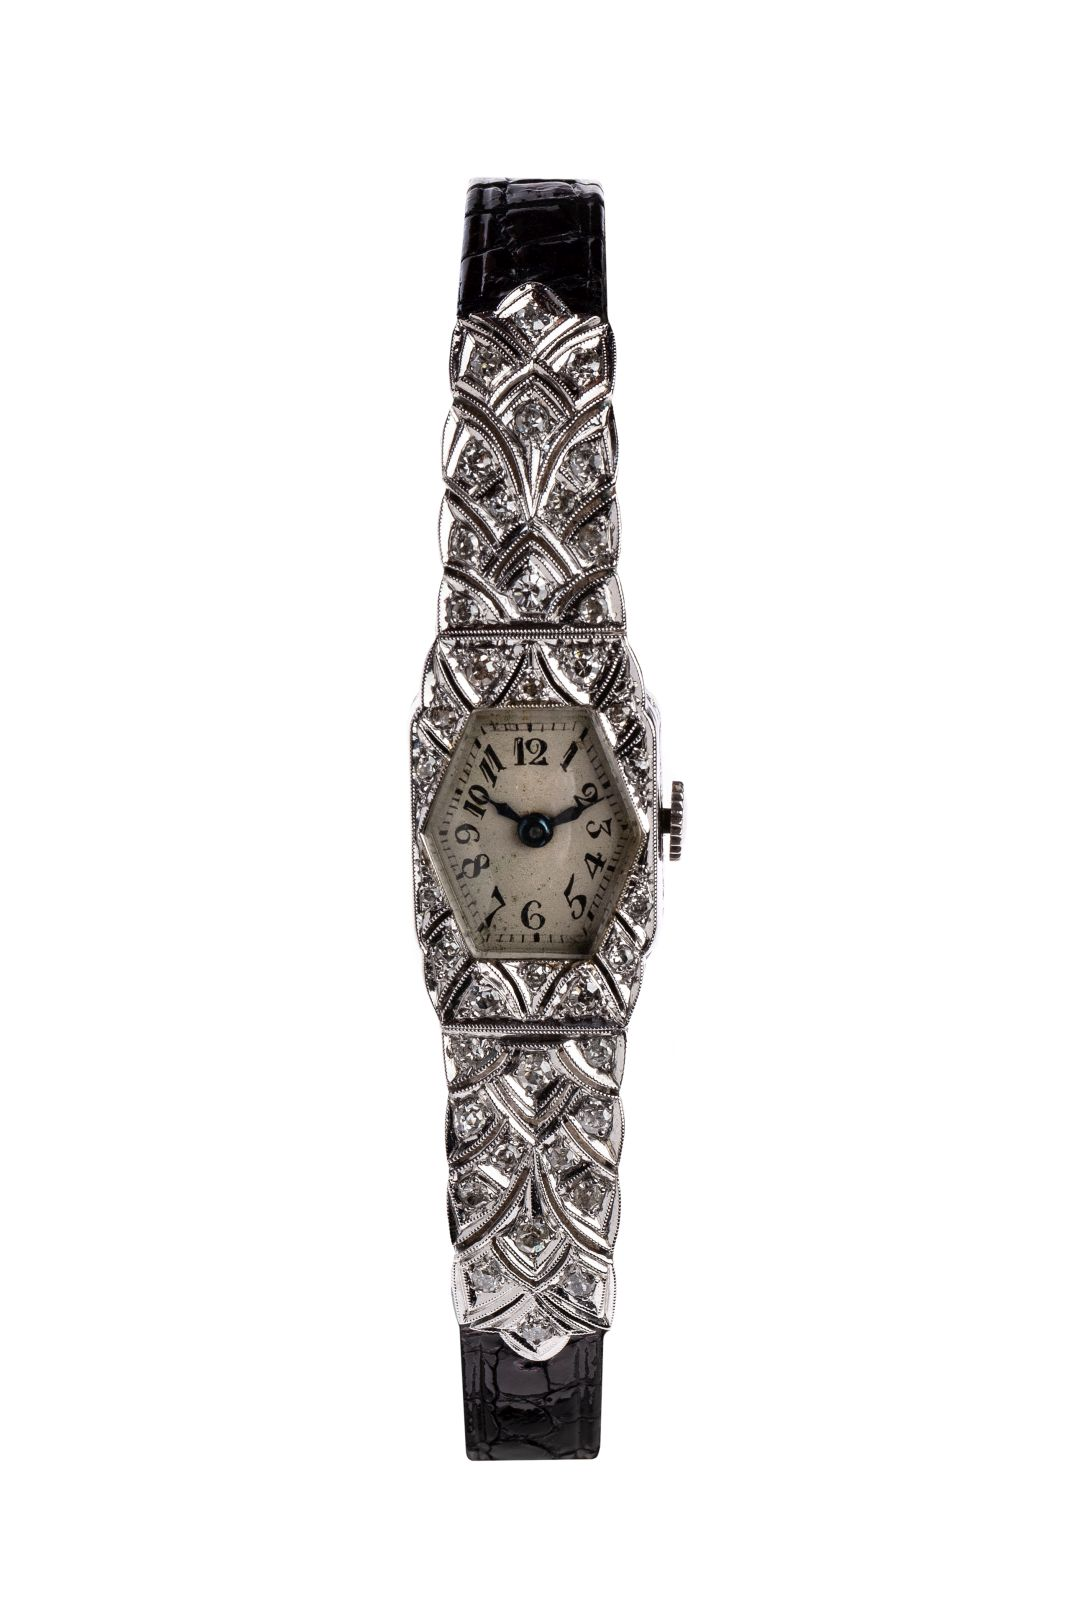 #26 Art Deco watch with stone setting | Art Deco Armbanduhr mit Steinbesatz Image